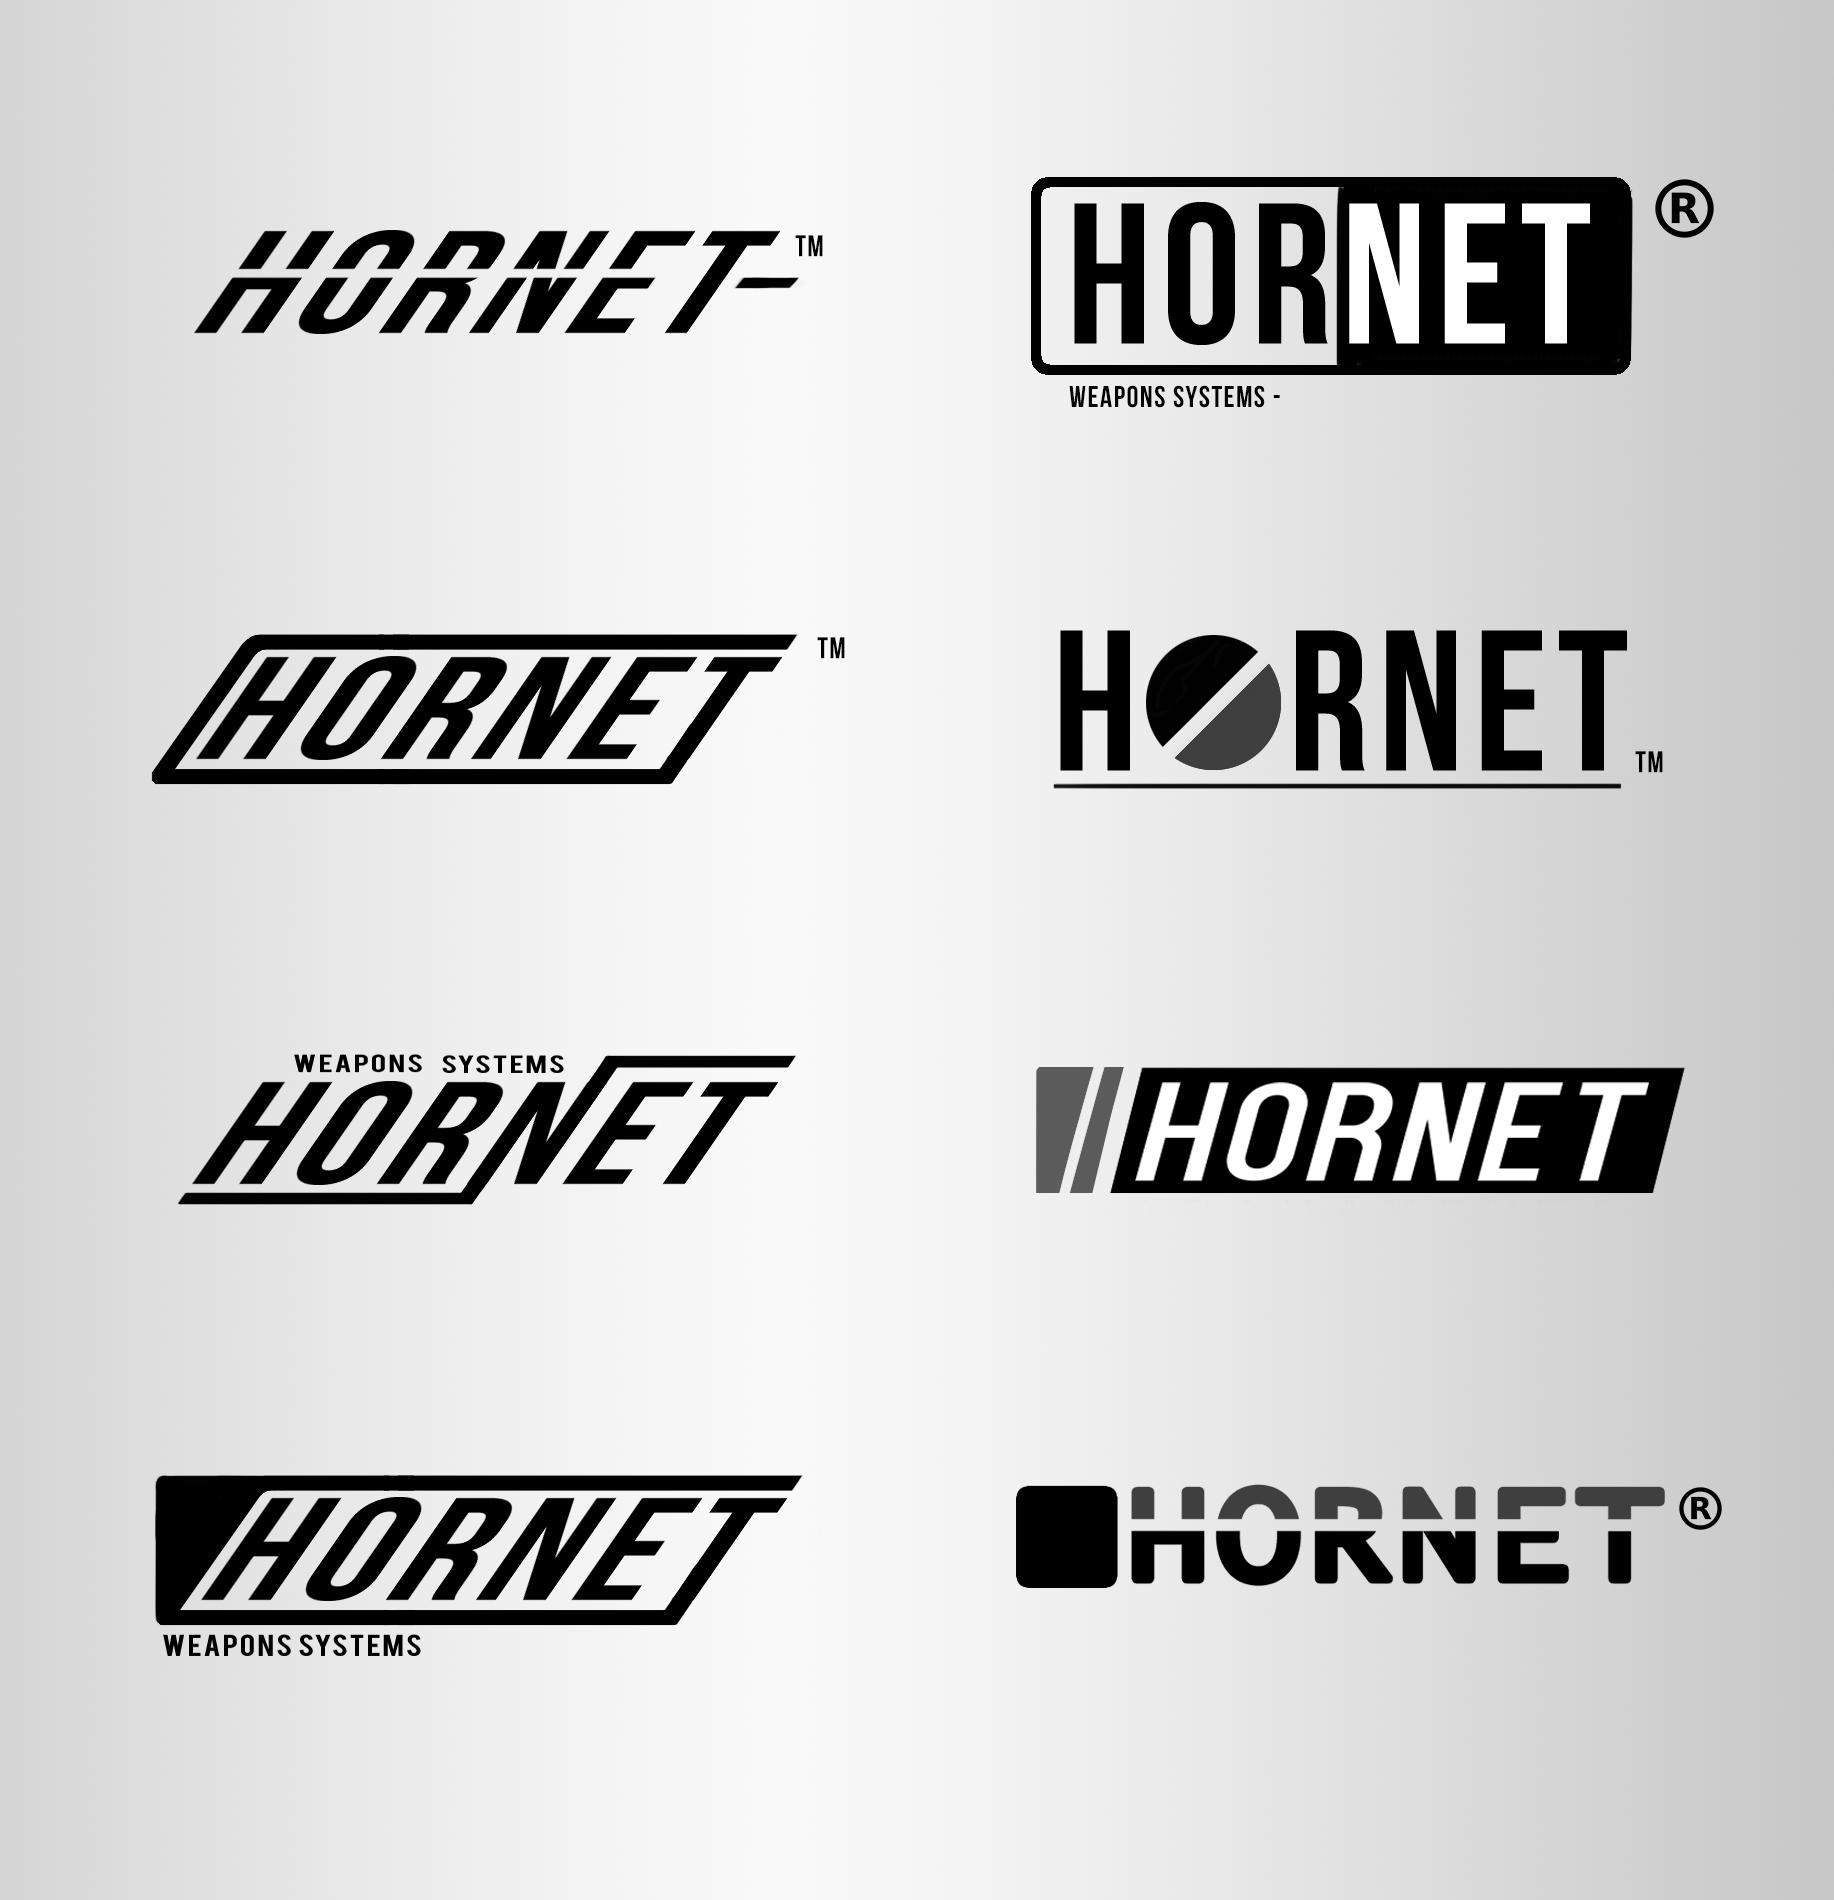 Hornet_logos.png